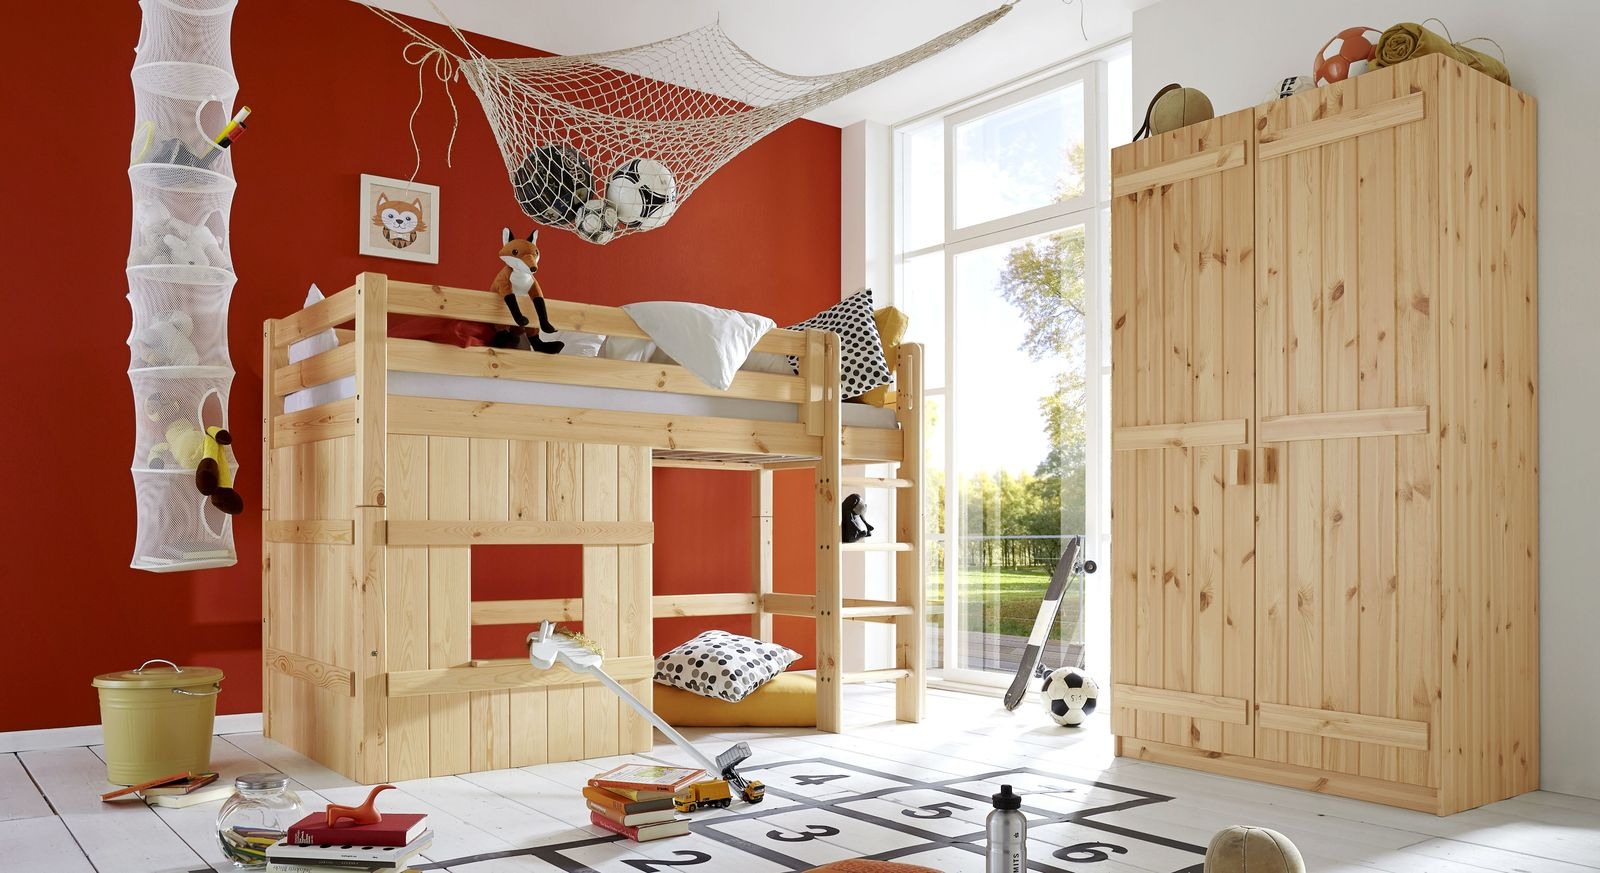 Hütten-Hochbett Kids Paradise Basic mit passendem Produktebild